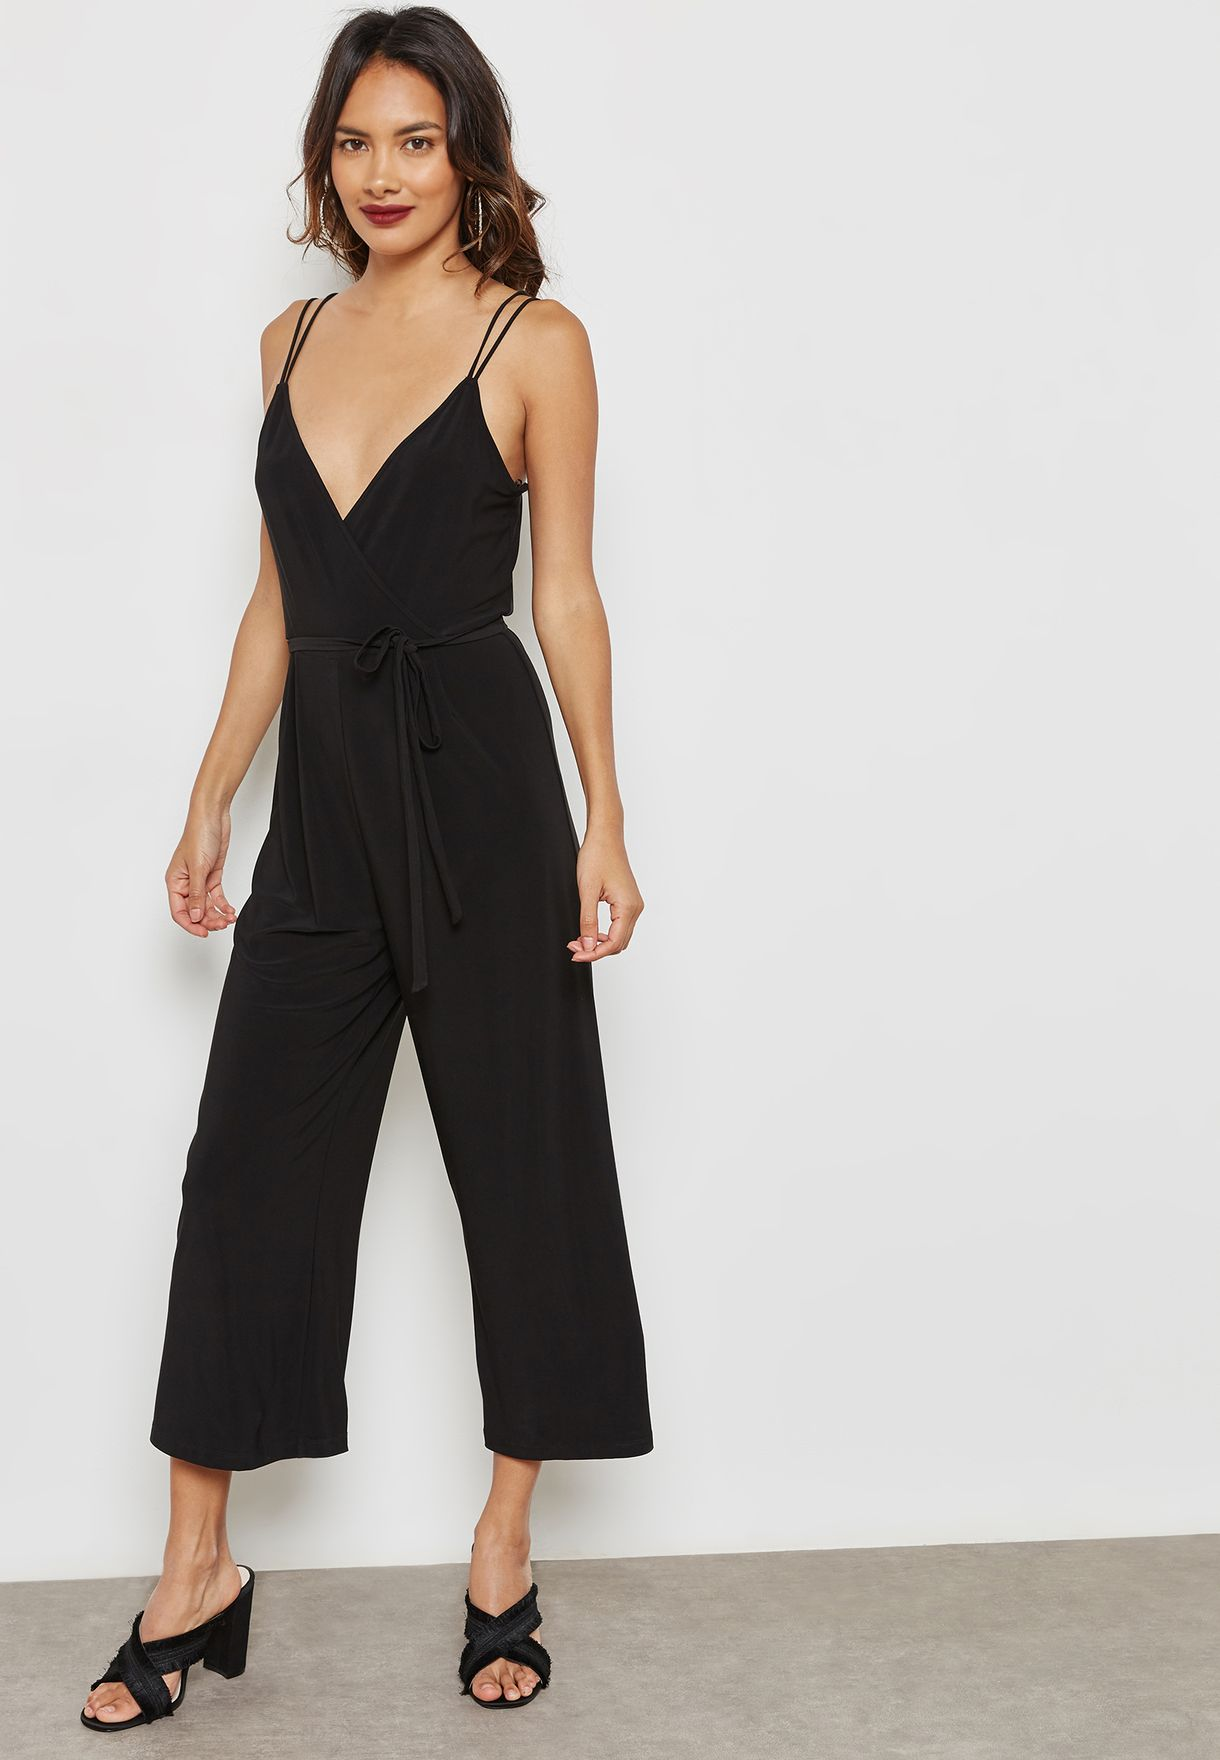 5c1e50322fc4 Shop Topshop black Tie Waist Plunge Jumpsuit 16V02MBLK for Women in ...